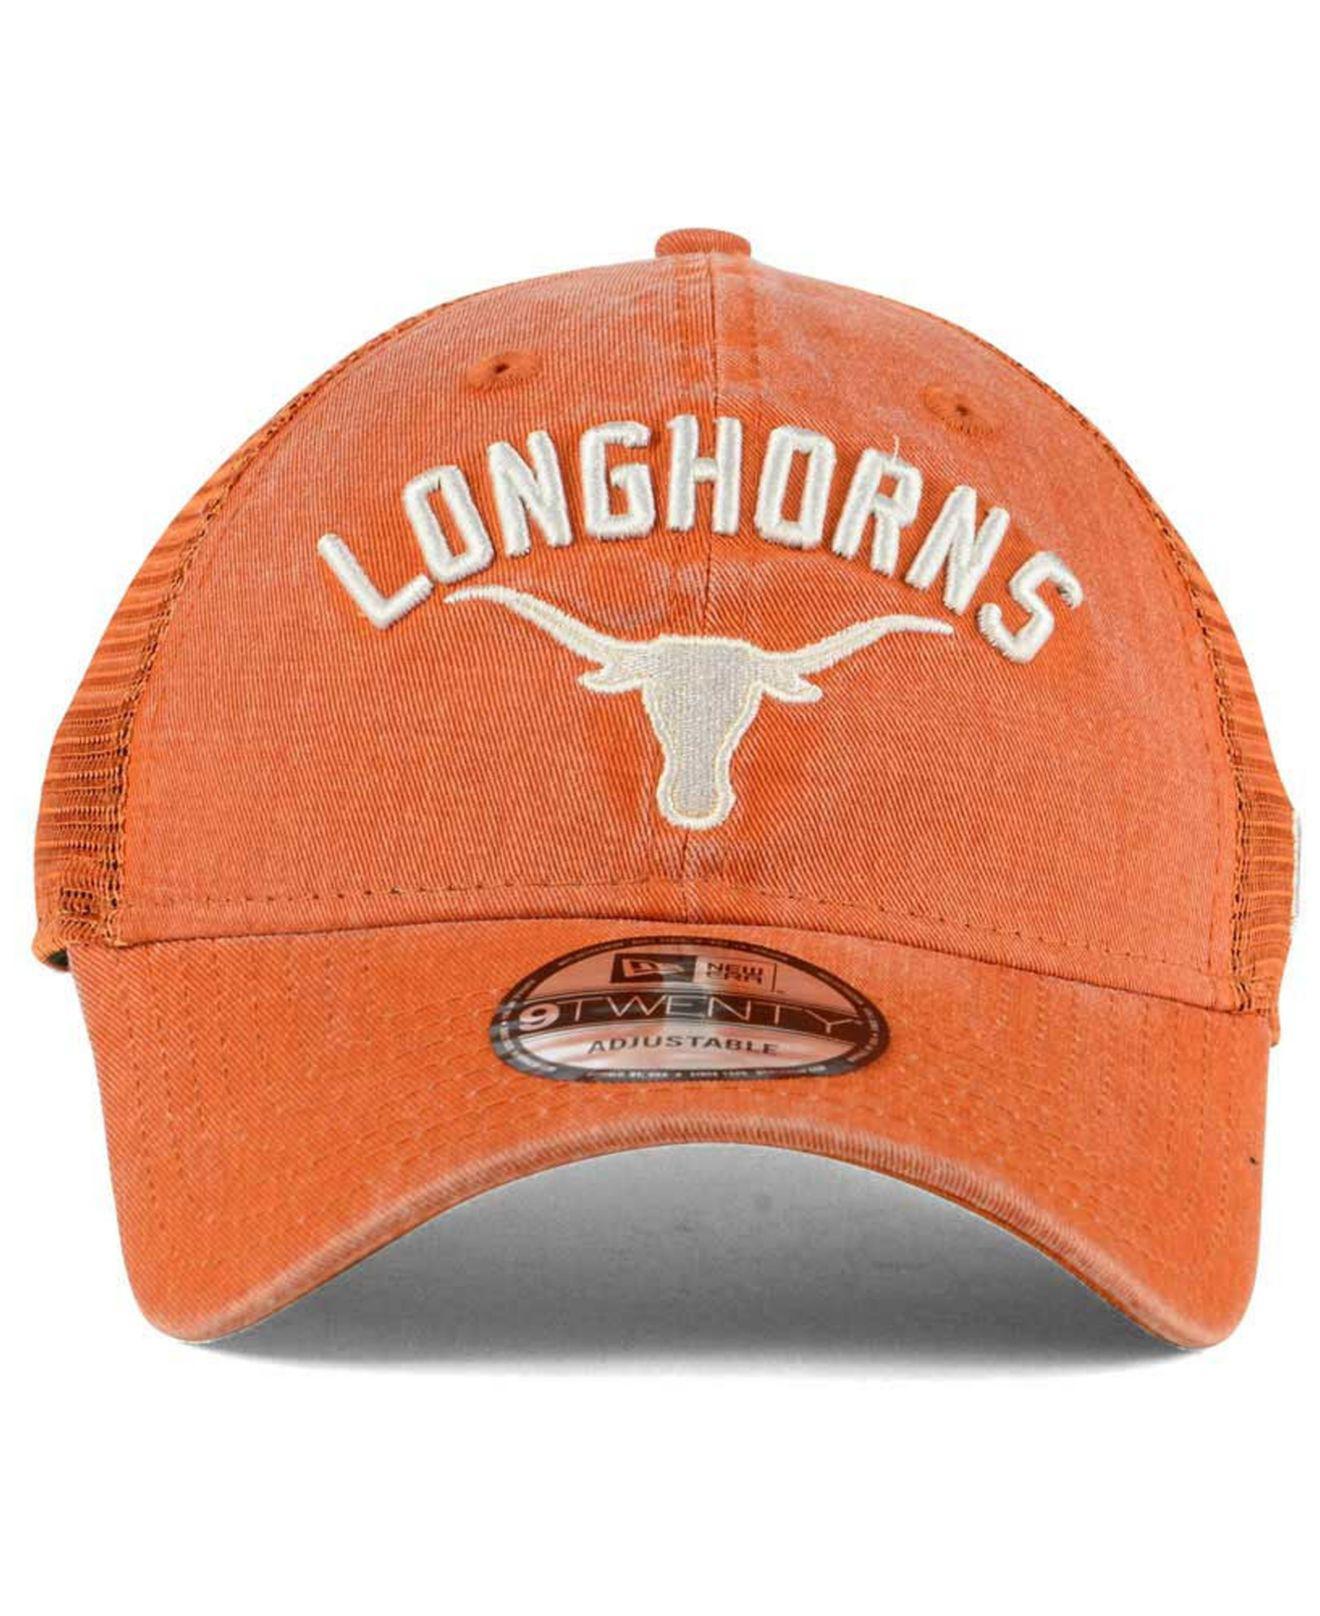 Lyst - Ktz Rugged Team 9twenty Cap in Orange for Men a1055746a